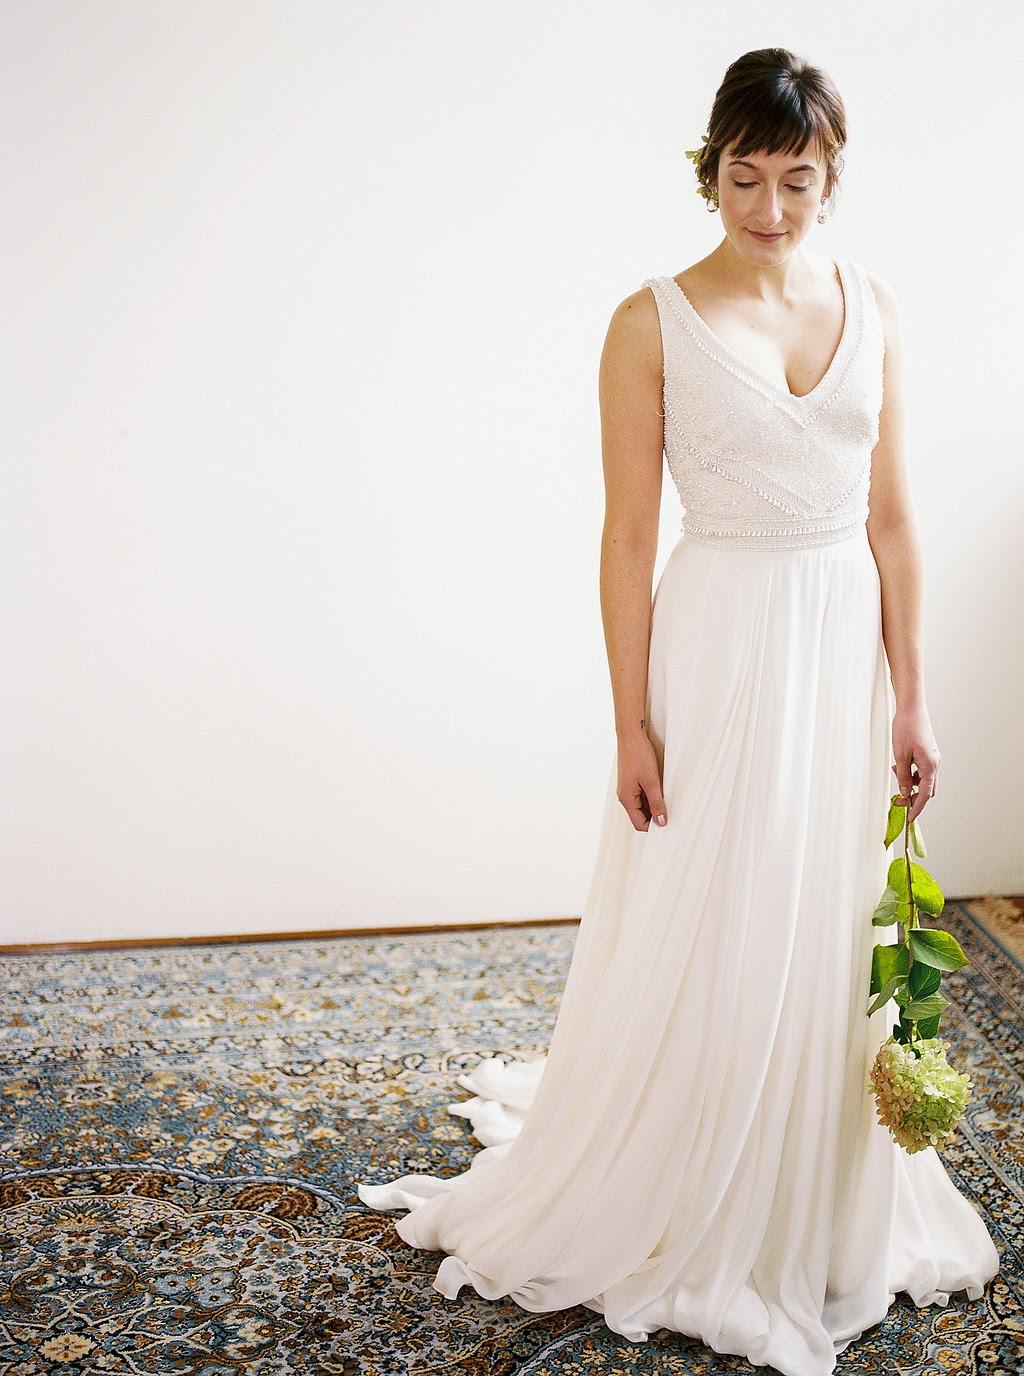 Alexandra-Elise-Photography-Ali-Reed-Film-Wedding-Photographer-133.jpg